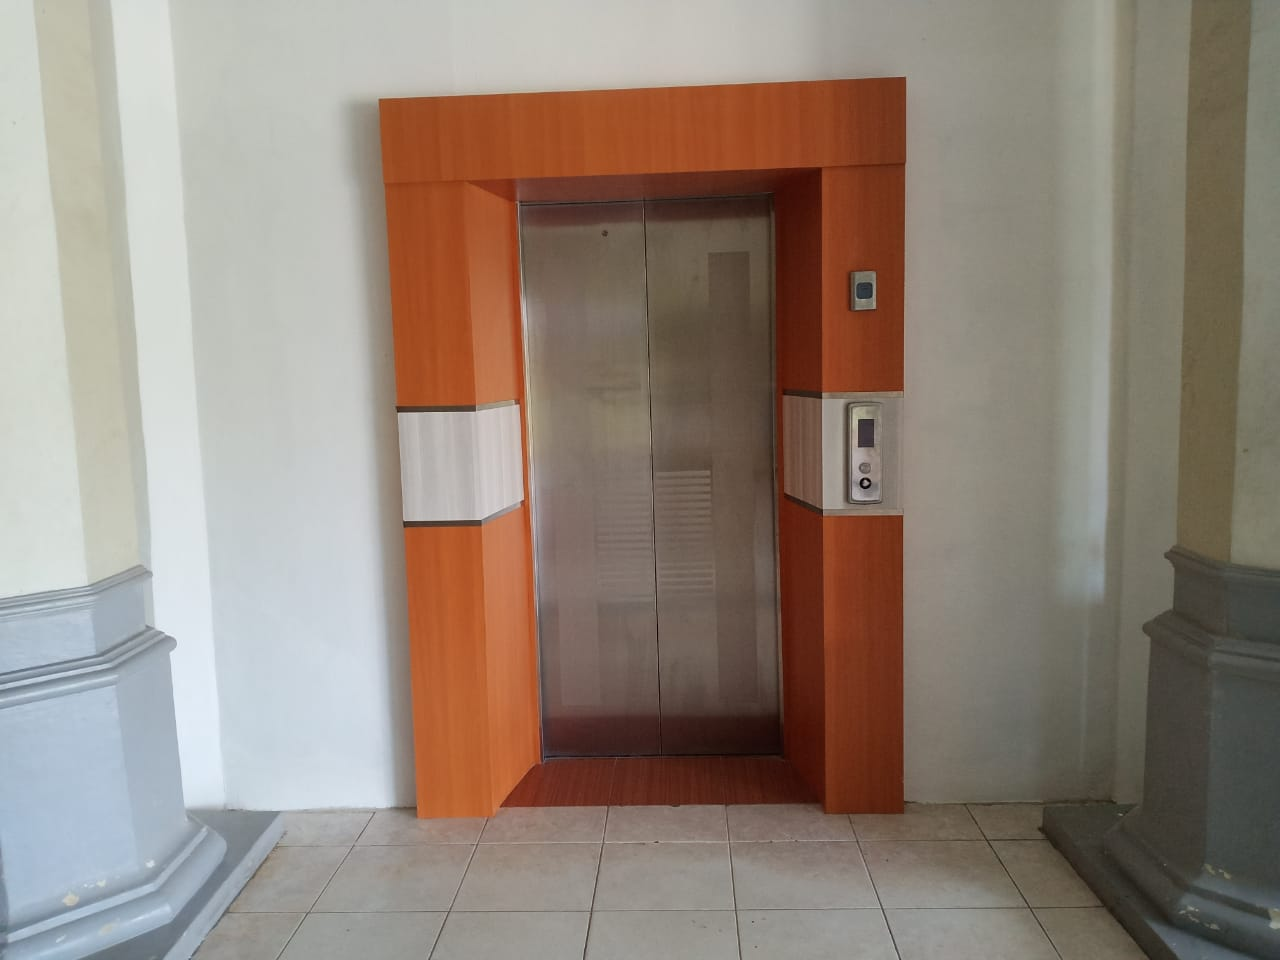 Keren! Kantor Bupati Aceh Tamiang Bangun Lift Khusus Penyandang Disabilitas